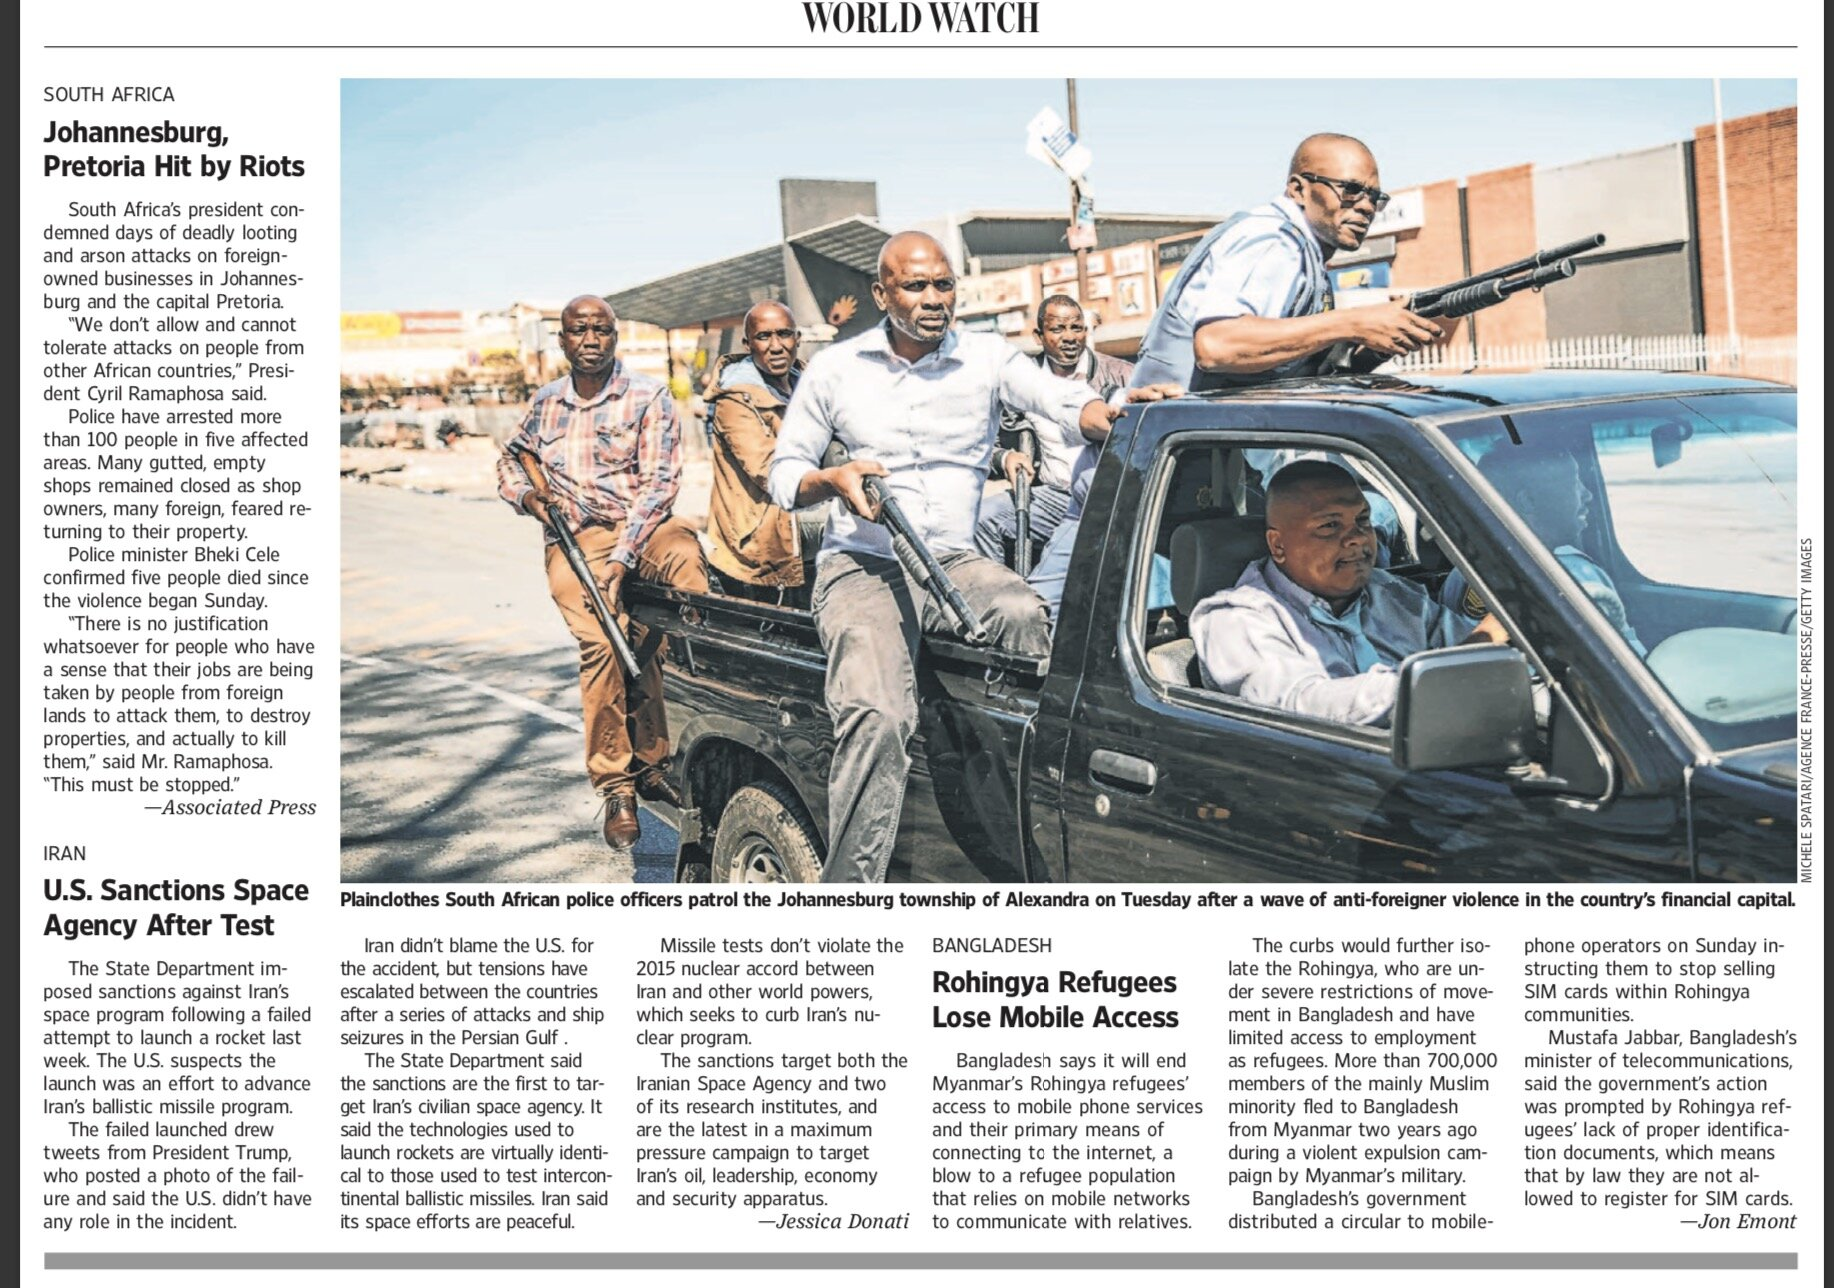 The Wall Street Journal - 04/09/2019